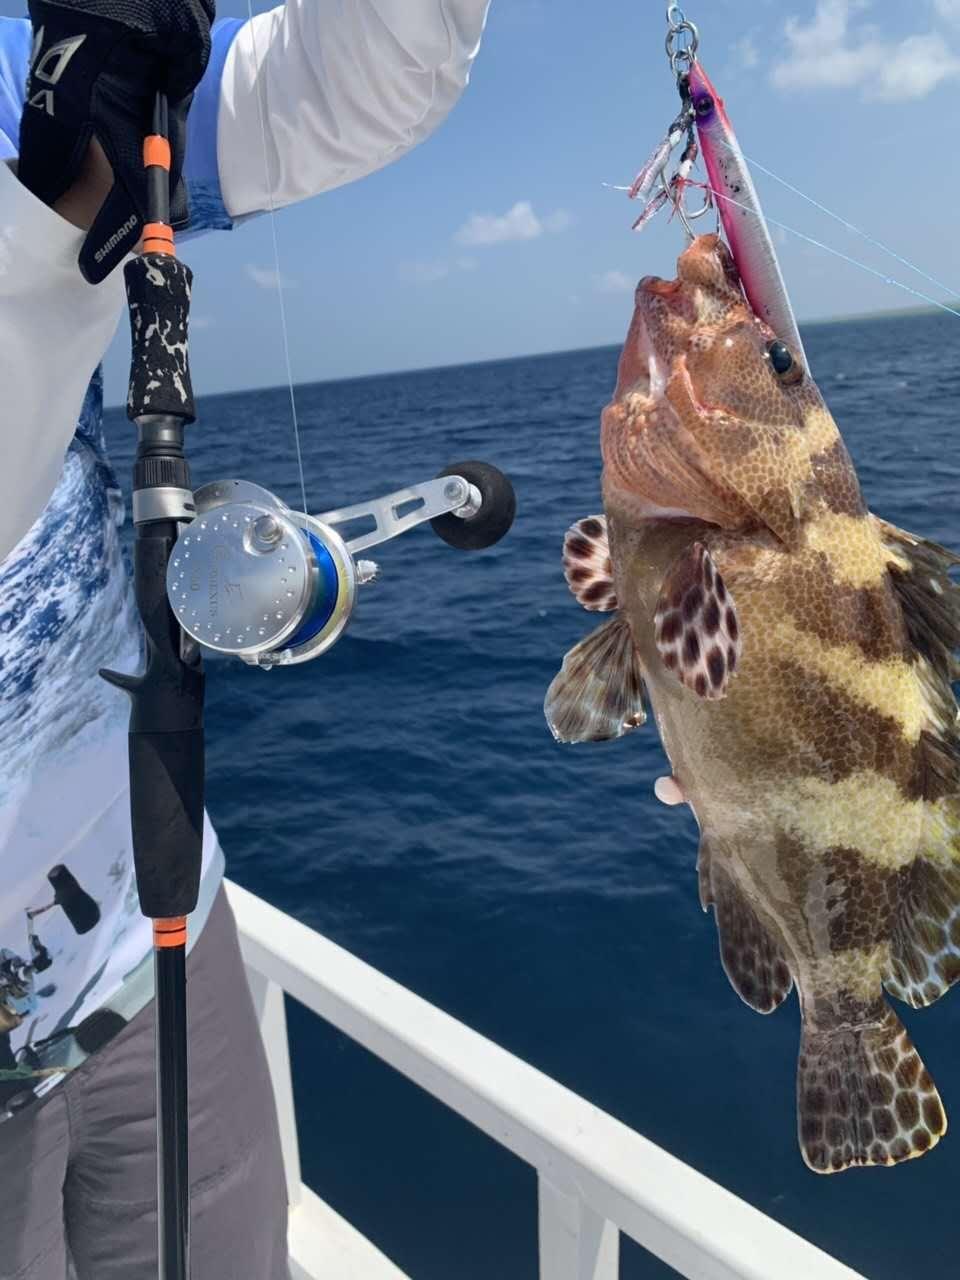 Gomexus Fishing Slow Jigging Reel High Speed Narrow Spool 7.1:1 Sea Tournament Big Game 30KG Super Light Perfect Right Left Reel